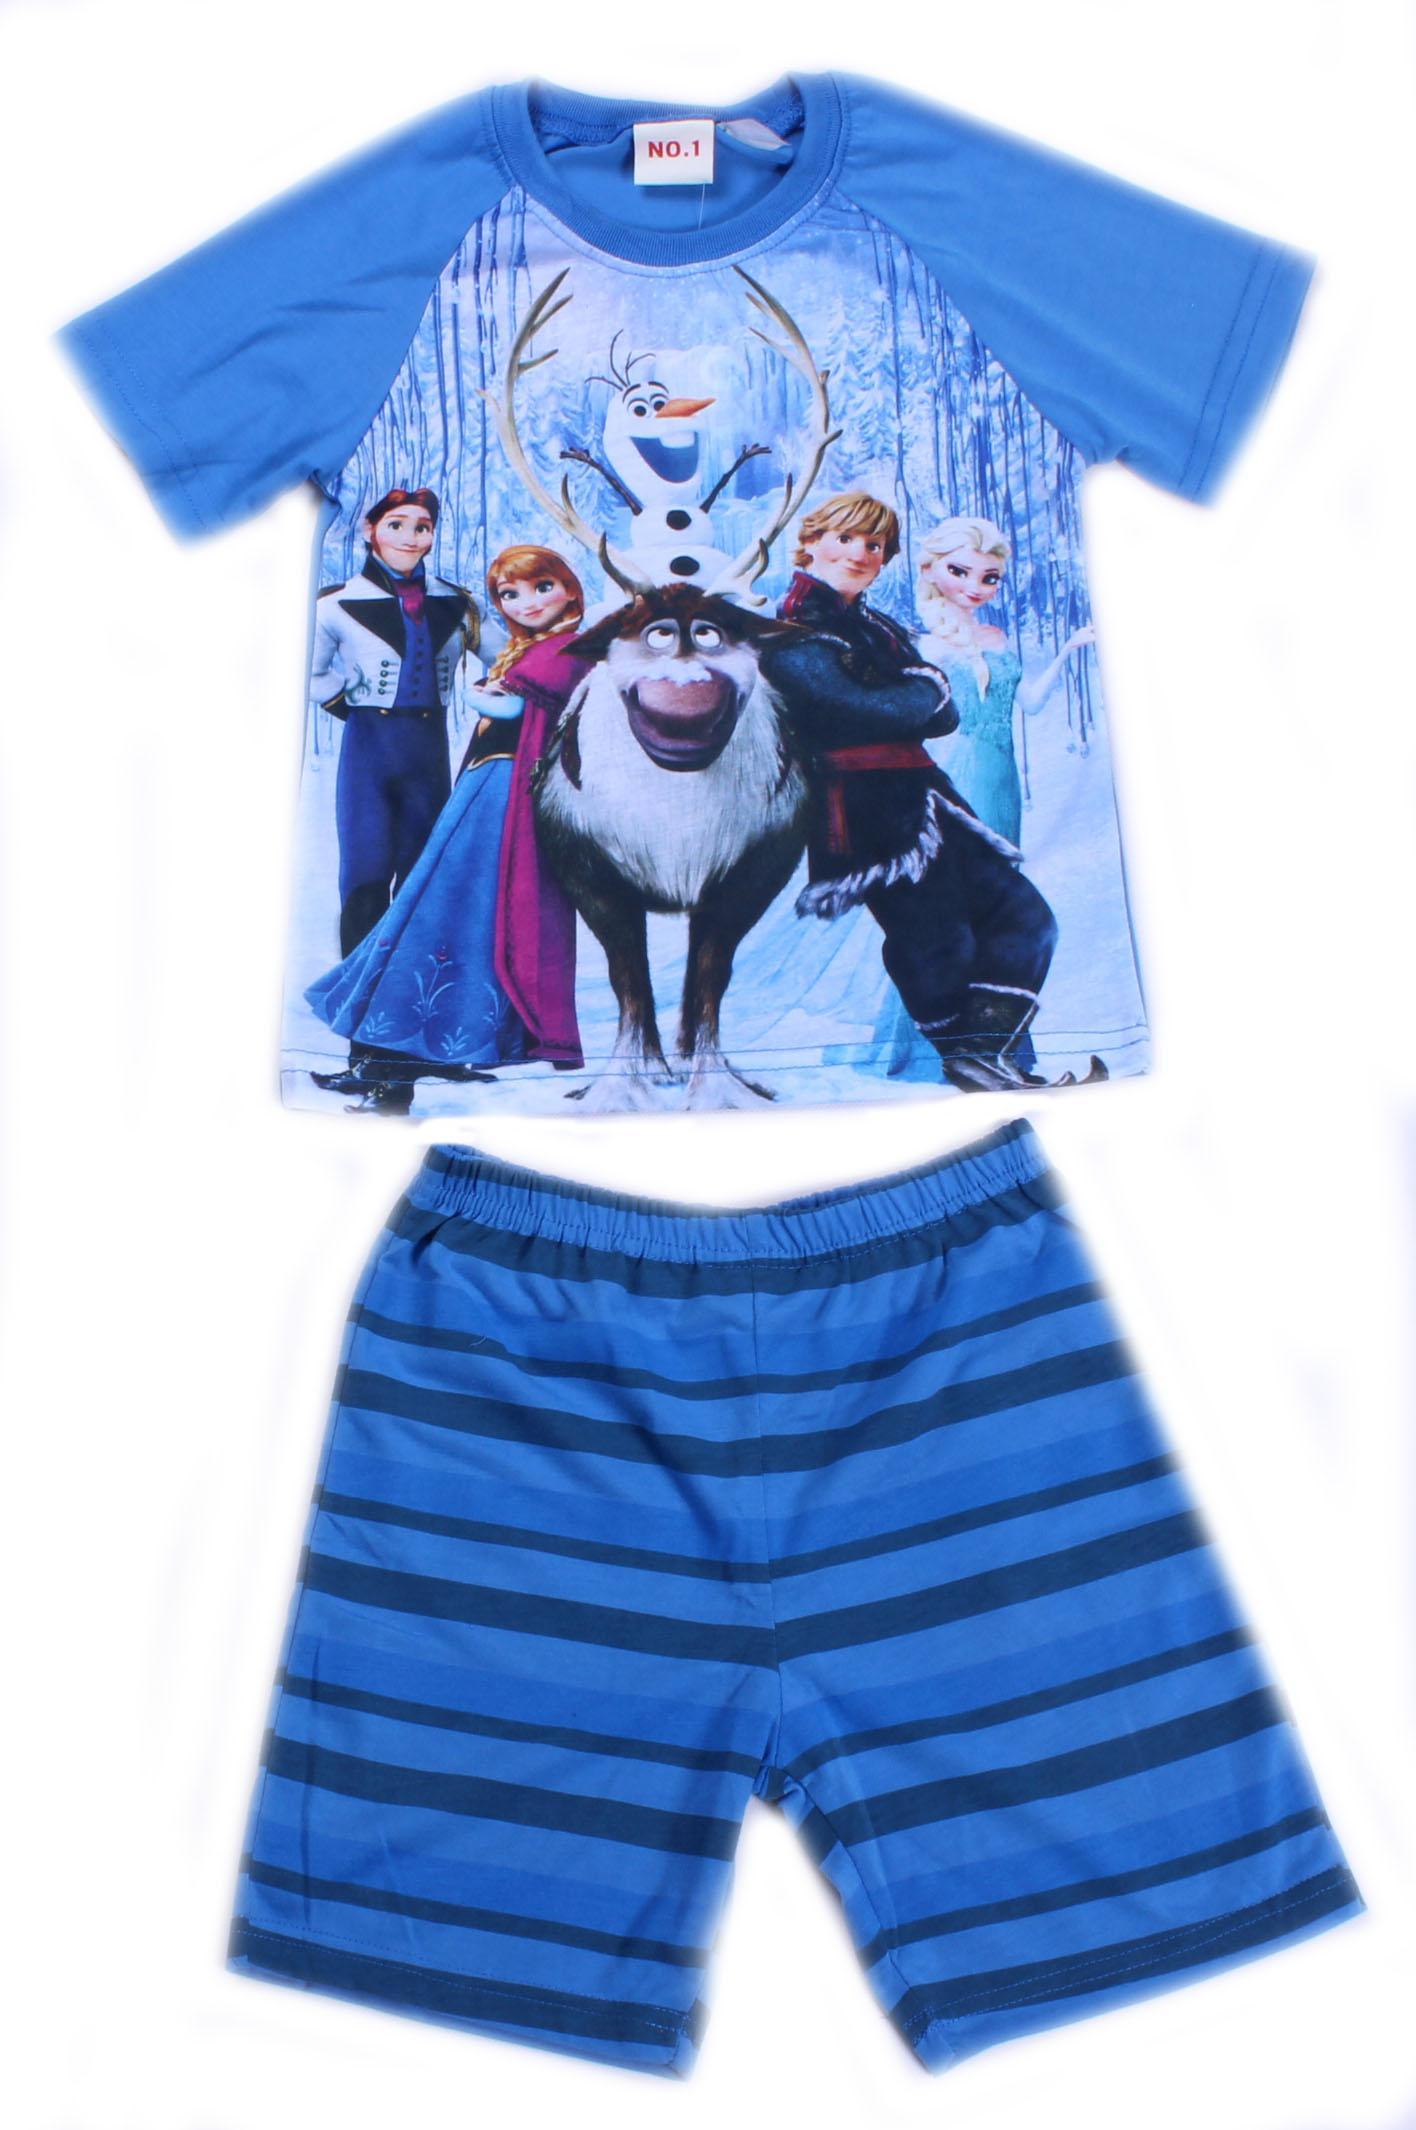 Short Pajamas For Boys Breeze Clothing